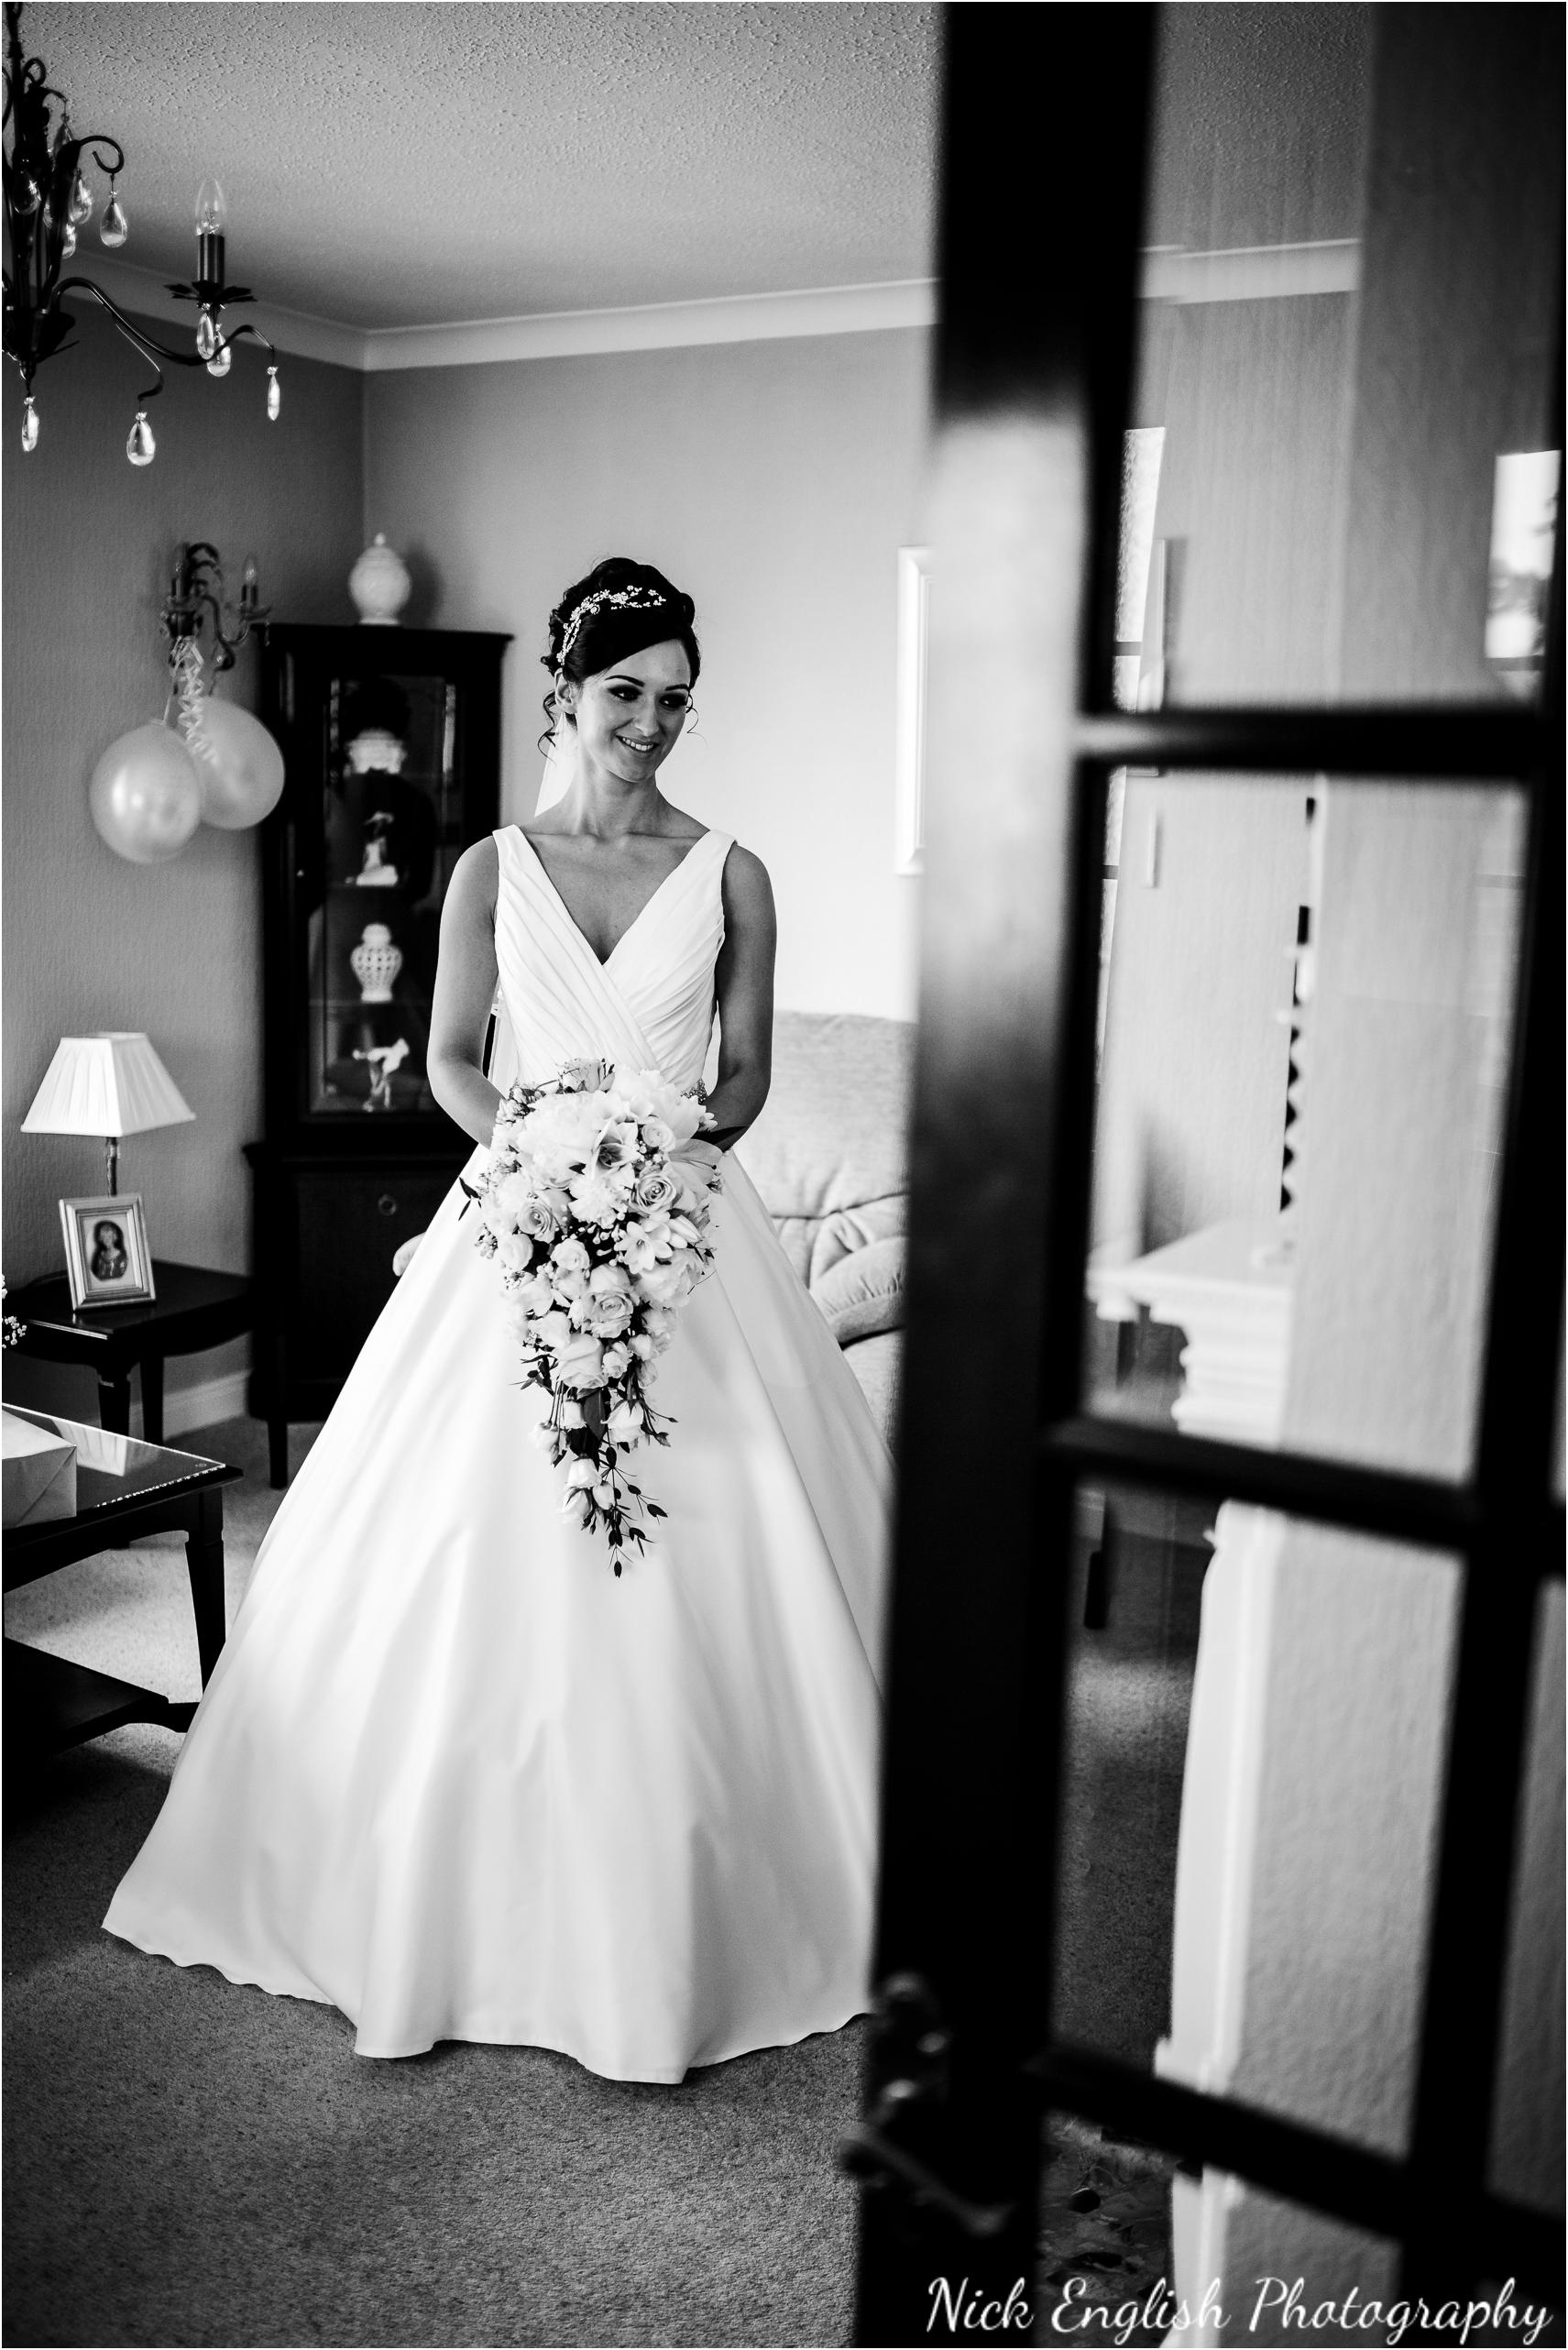 Emily David Wedding Photographs at Barton Grange Preston by Nick English Photography 39jpg.jpeg